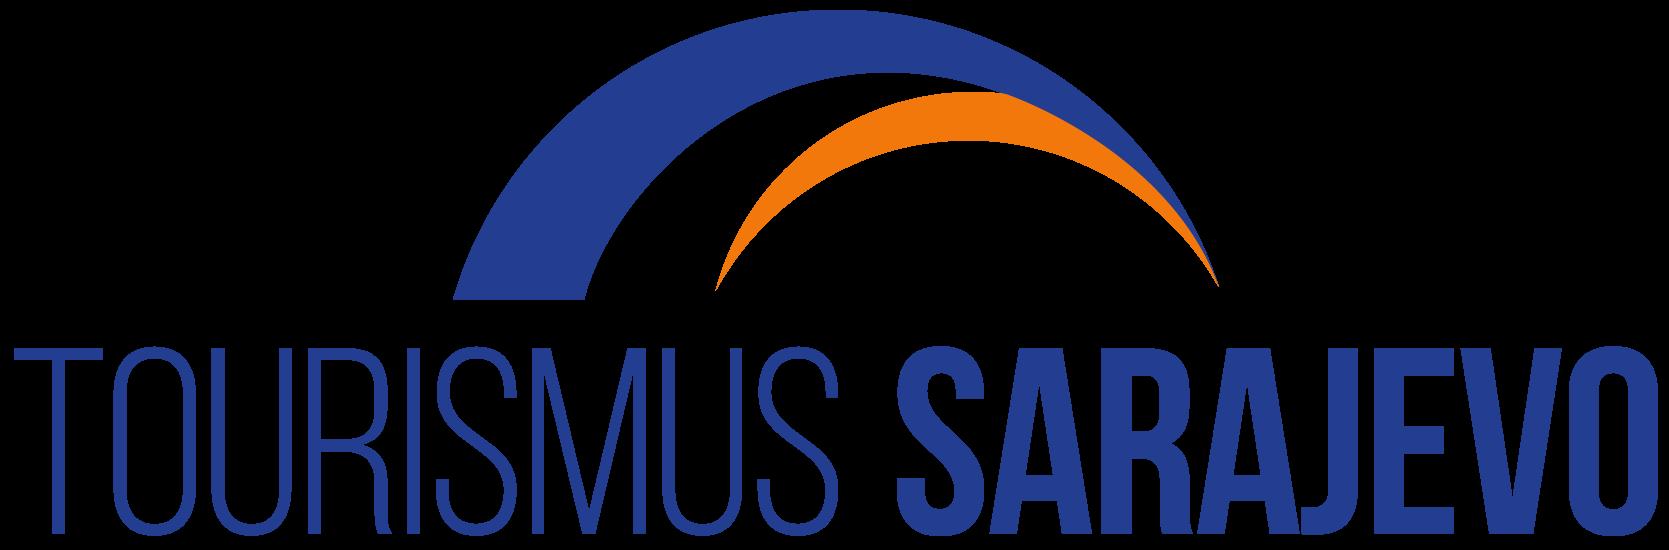 Tourismus Sarajevo Logo